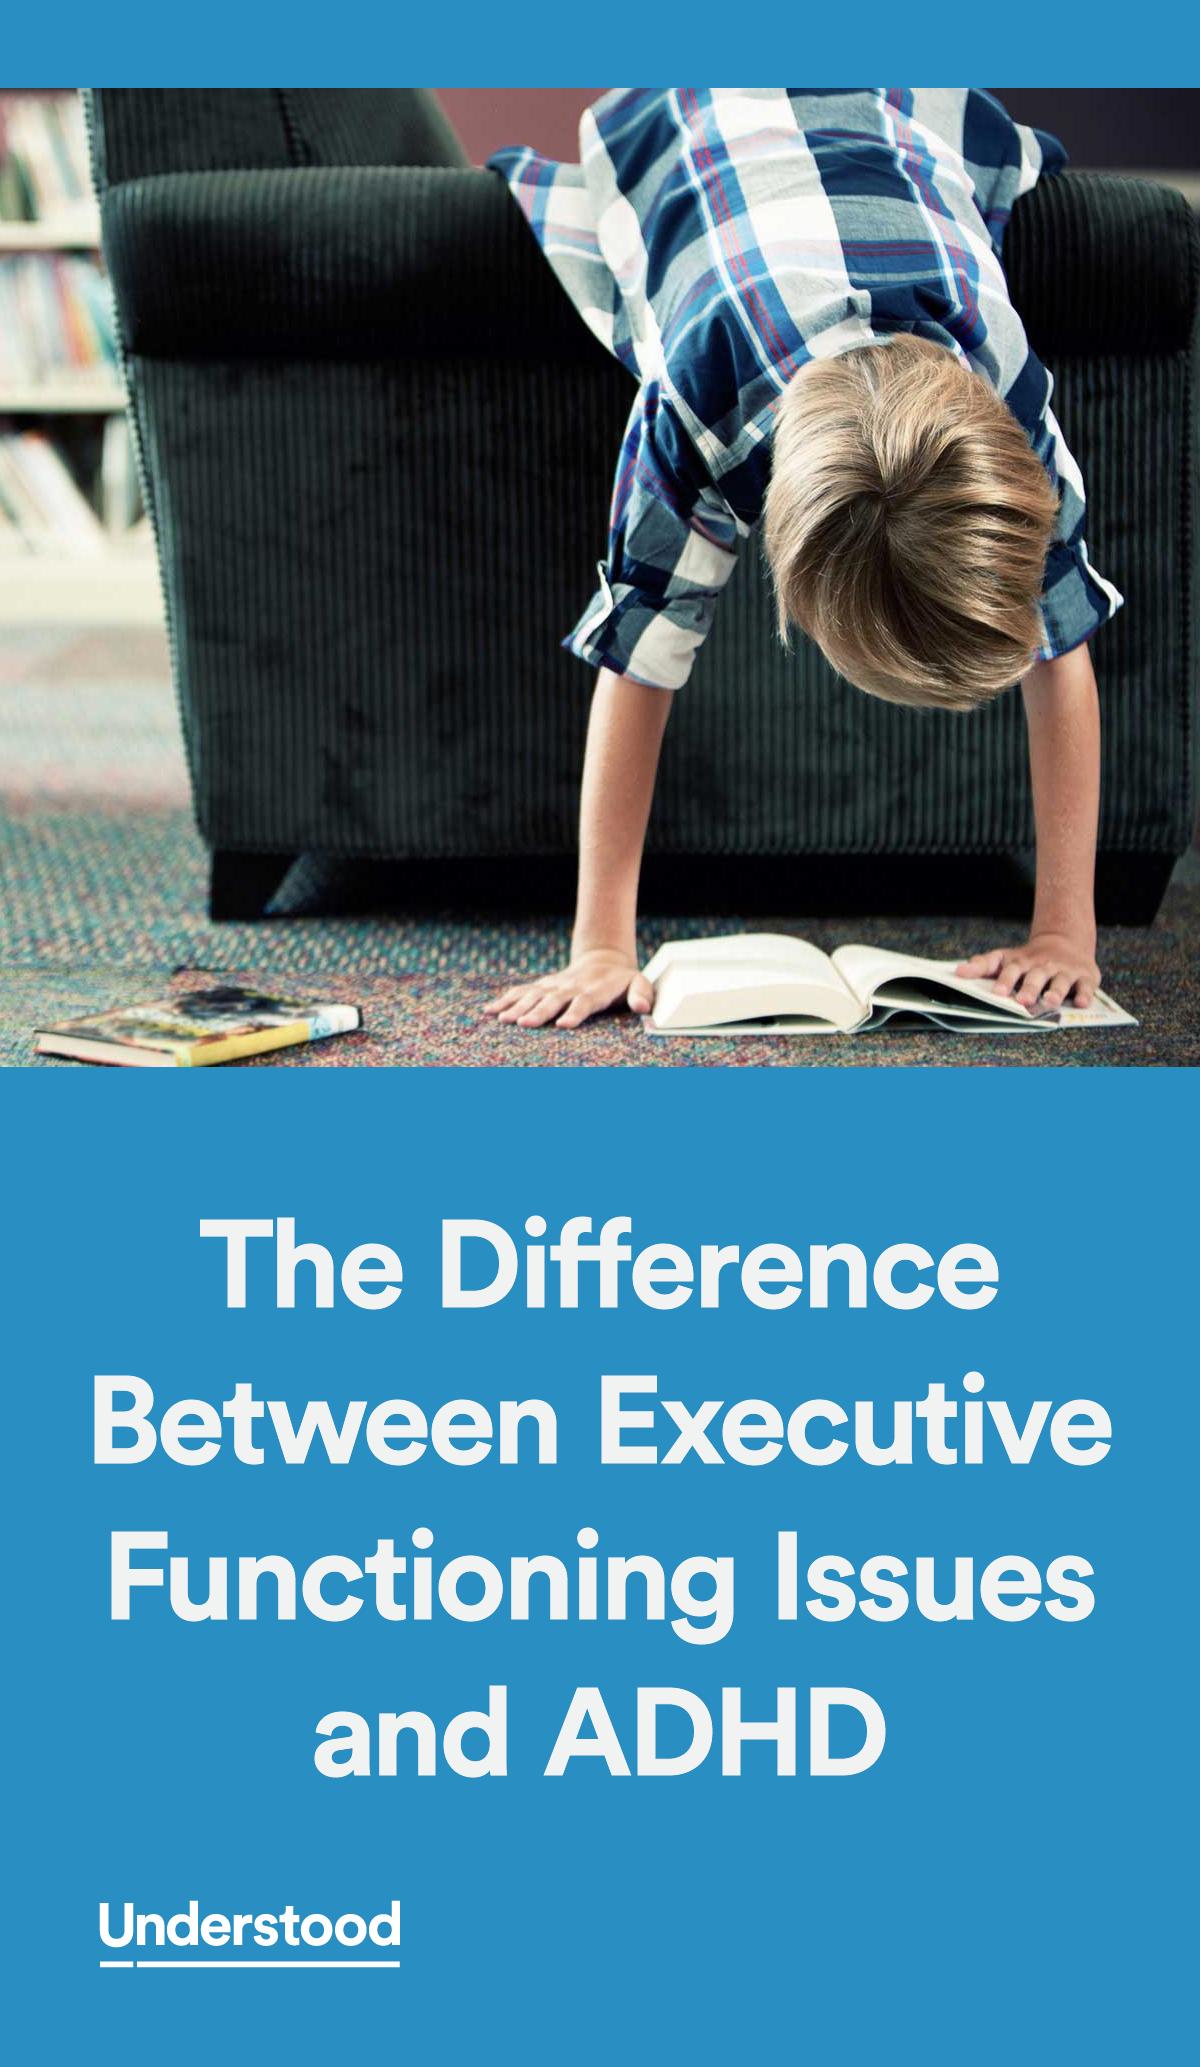 Understood Founding Partner Child Mind Institute Explains